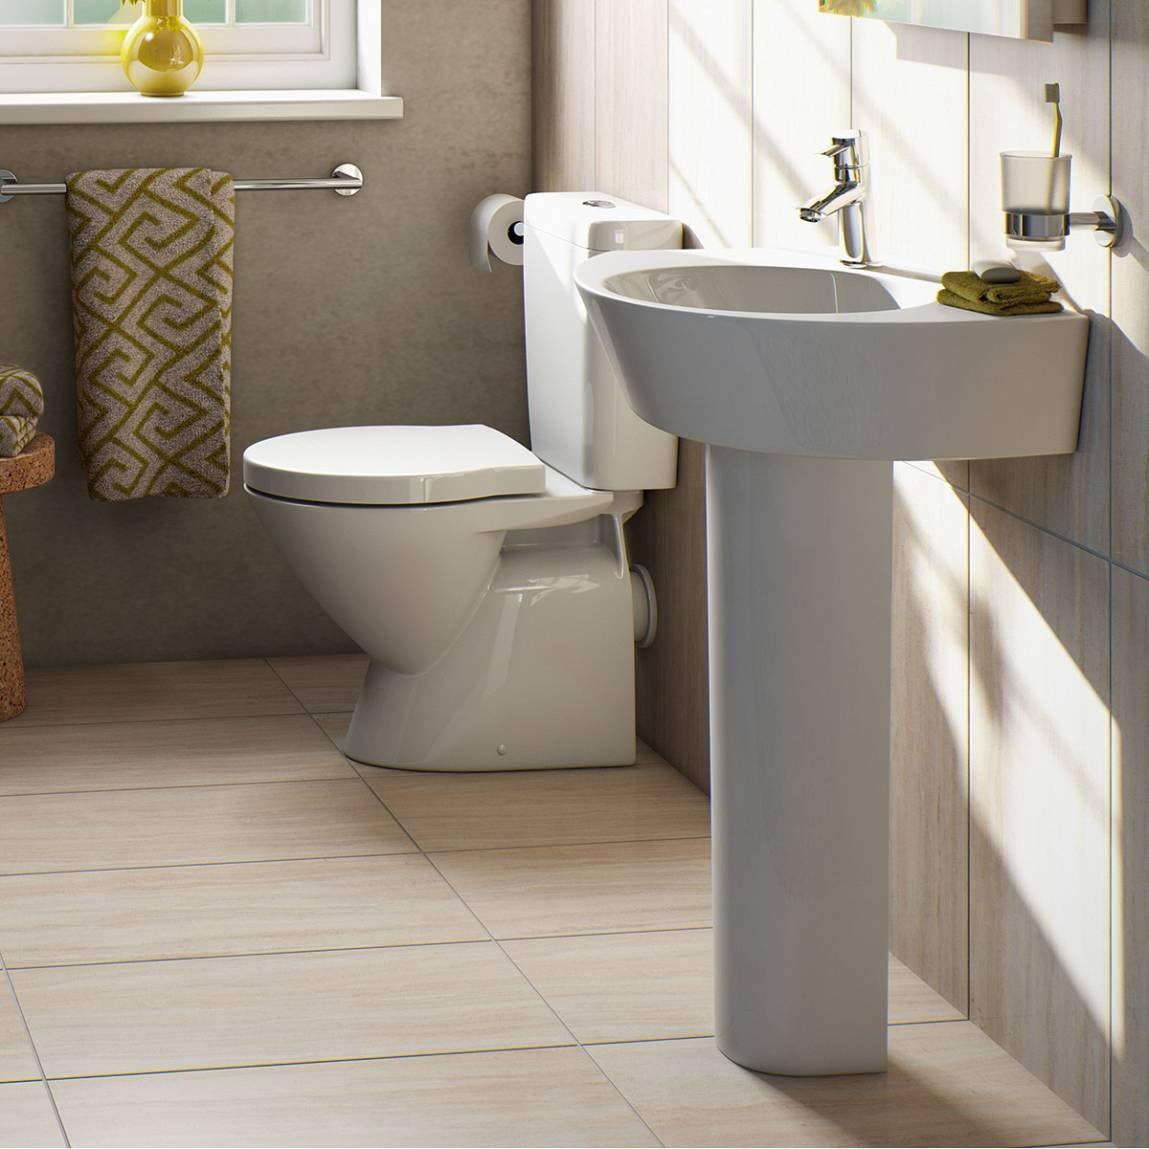 Ancona 4 Piece Bathroom Suite Victoria Plumb